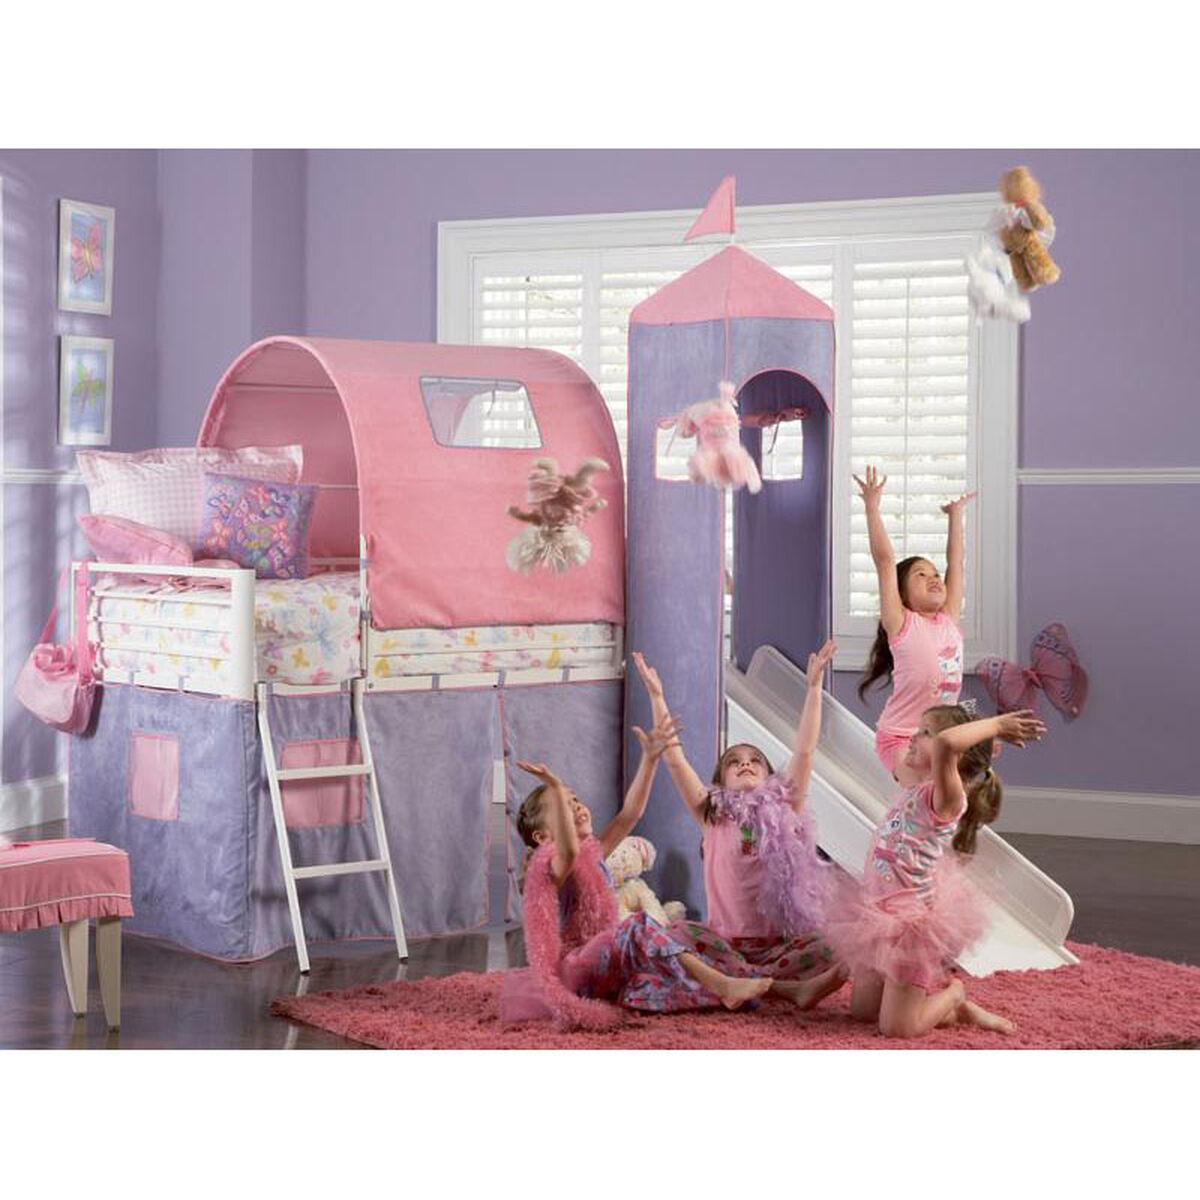 Princess Castle Bunk Bed Twin 374 069 Bizchair Com